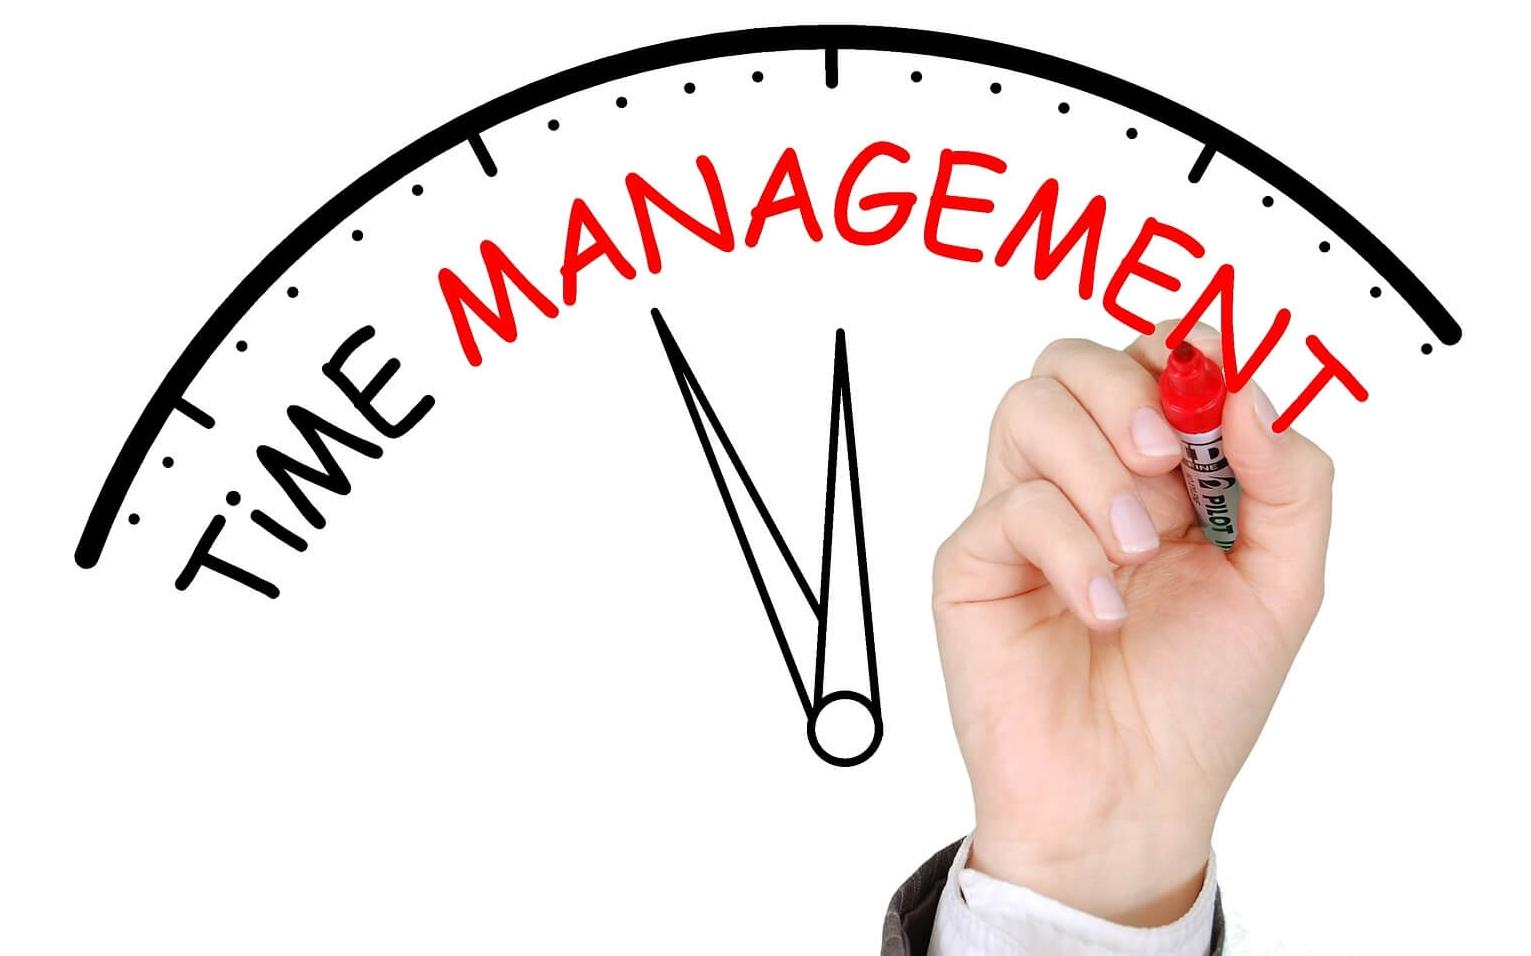 time-management-1966396_1920.jpg